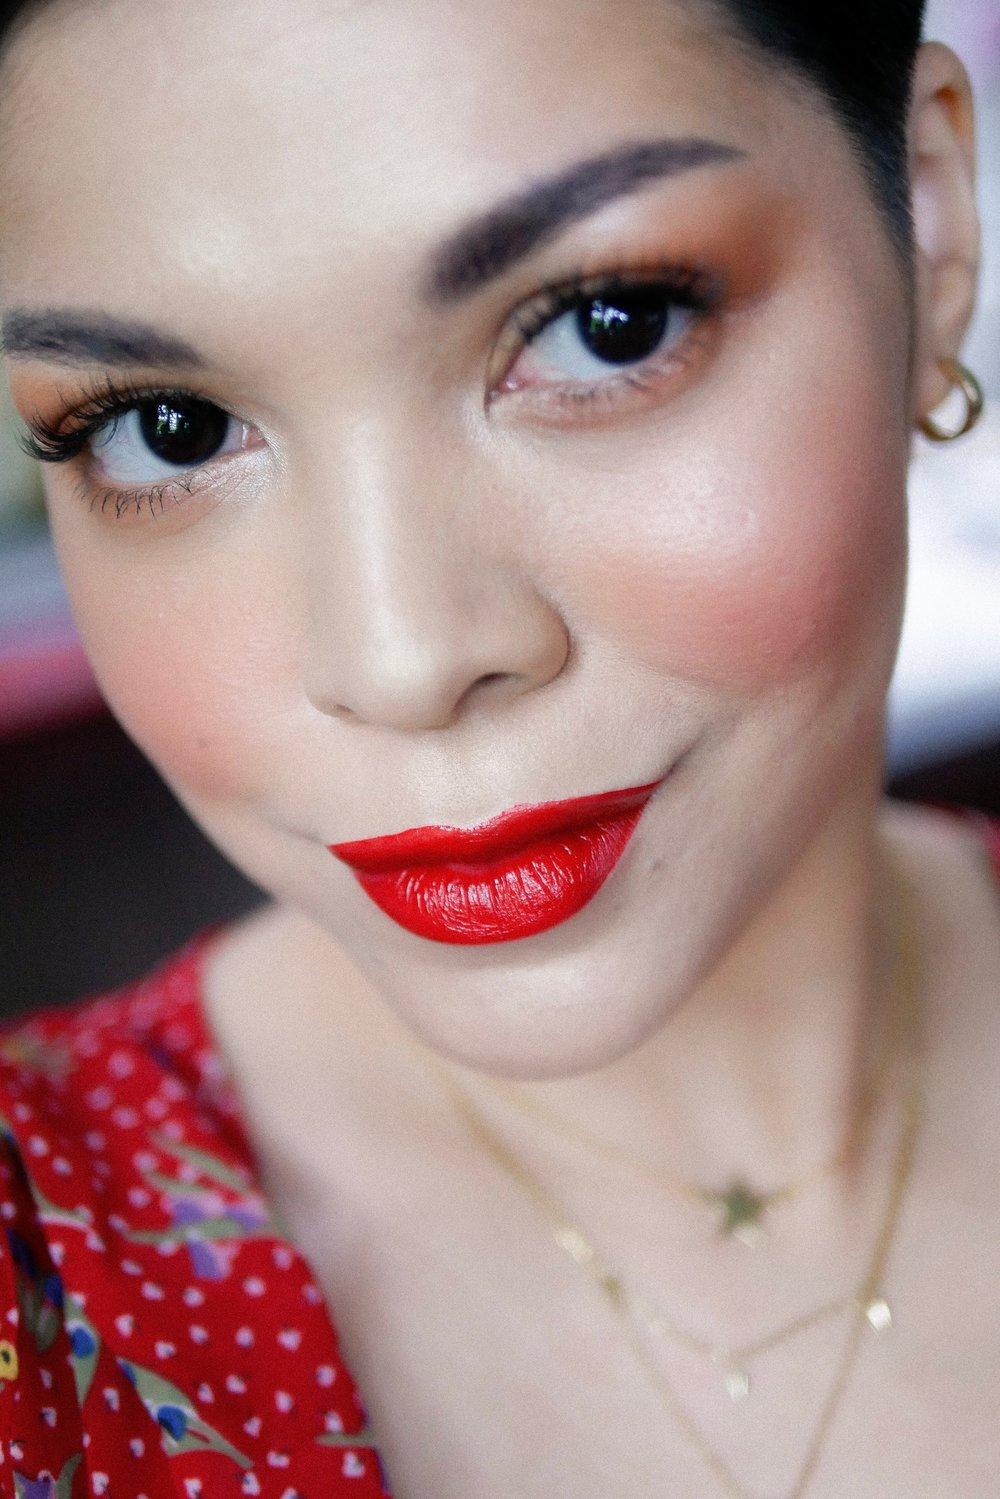 Di sini aku menggunakan  SYCA Lip Tint  shade 01. Red Rose